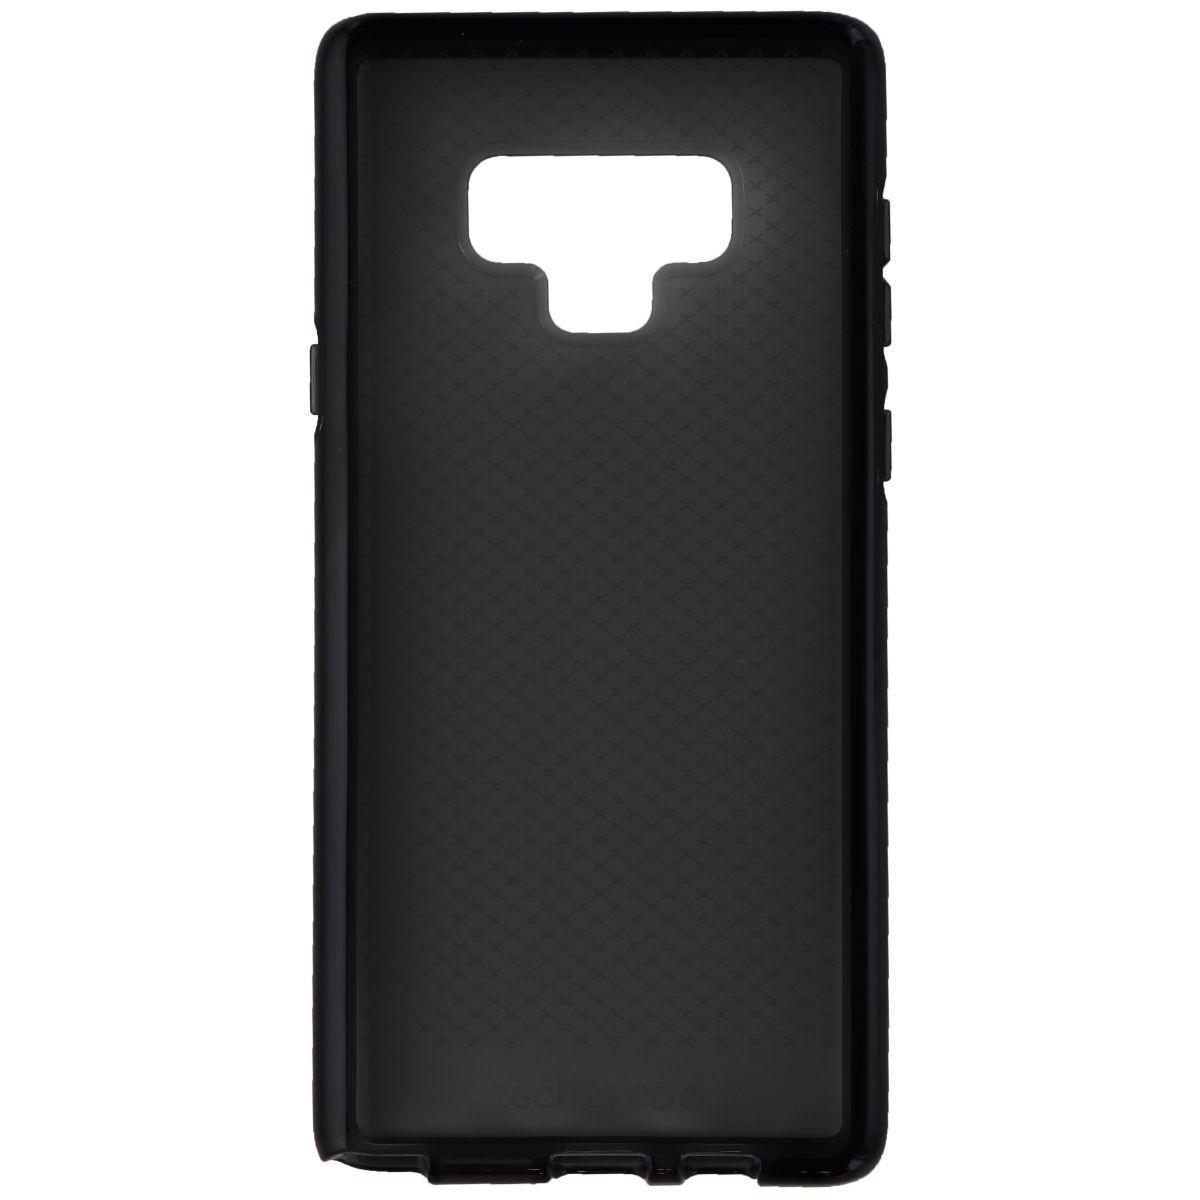 Tech21 Evo Check Series Gel Case for Samsung Galaxy Note 9 - Smokey Black